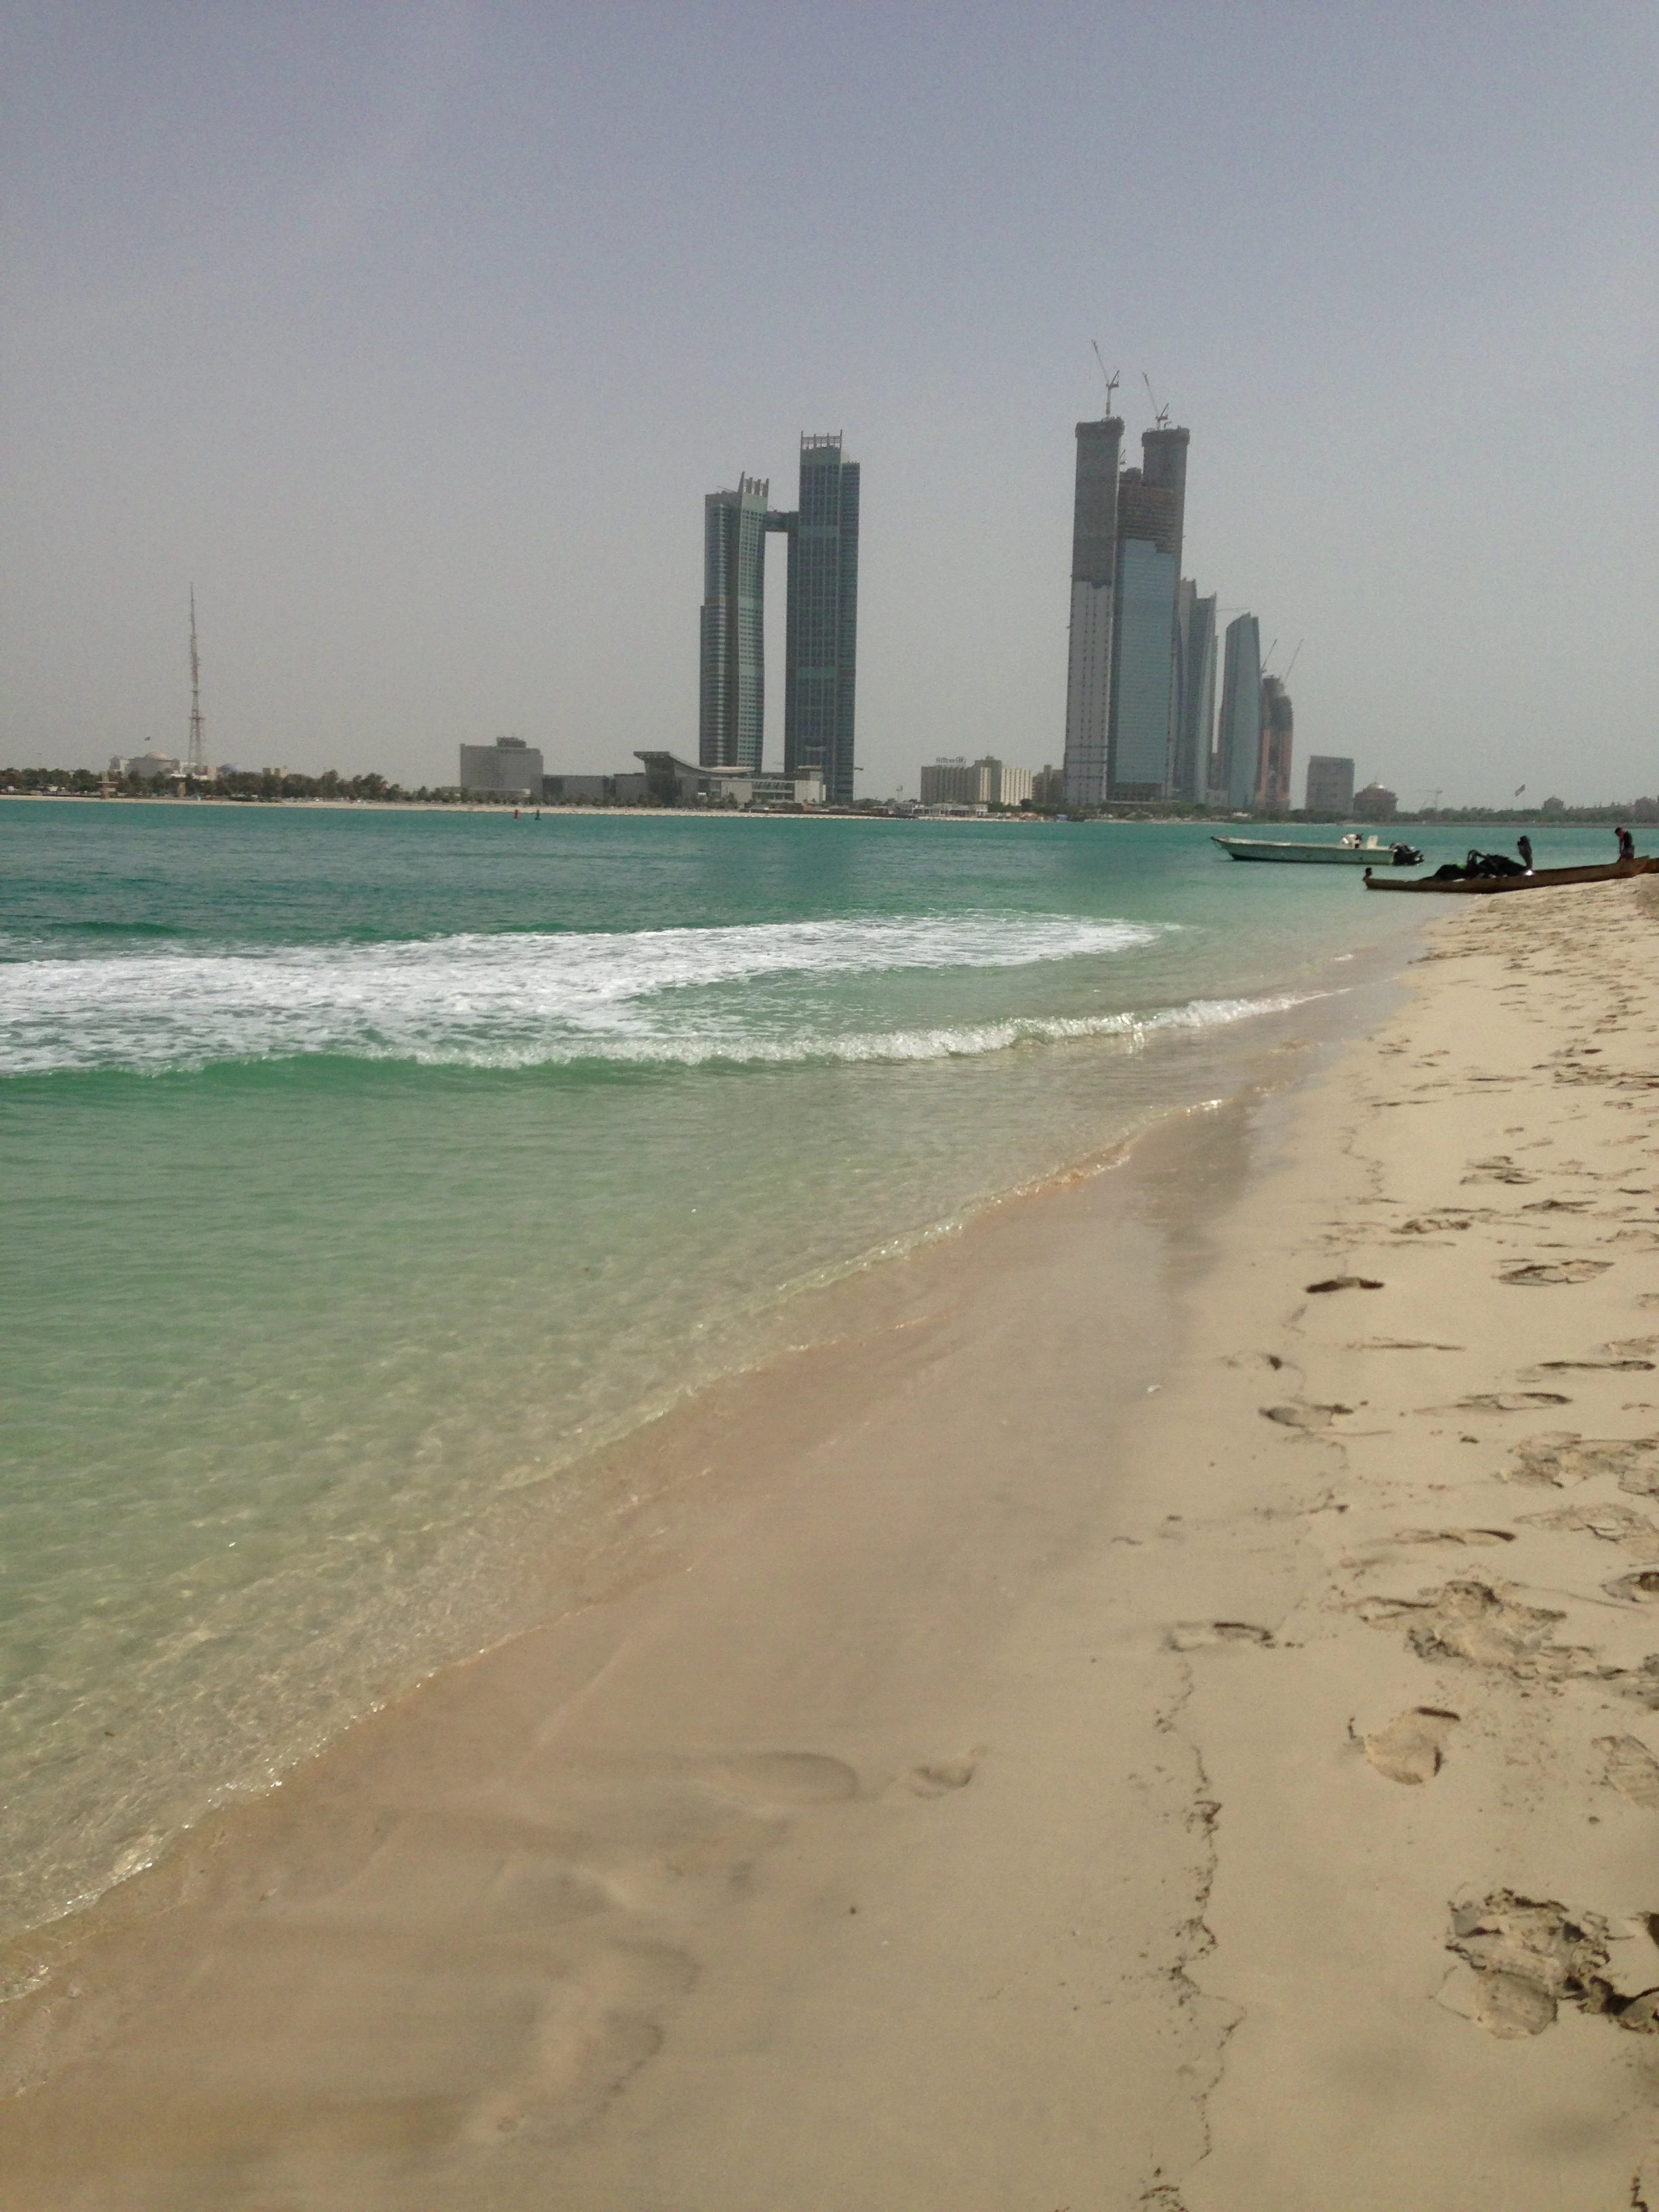 A scene I captured in Abu Dhabi on my iPhone last year